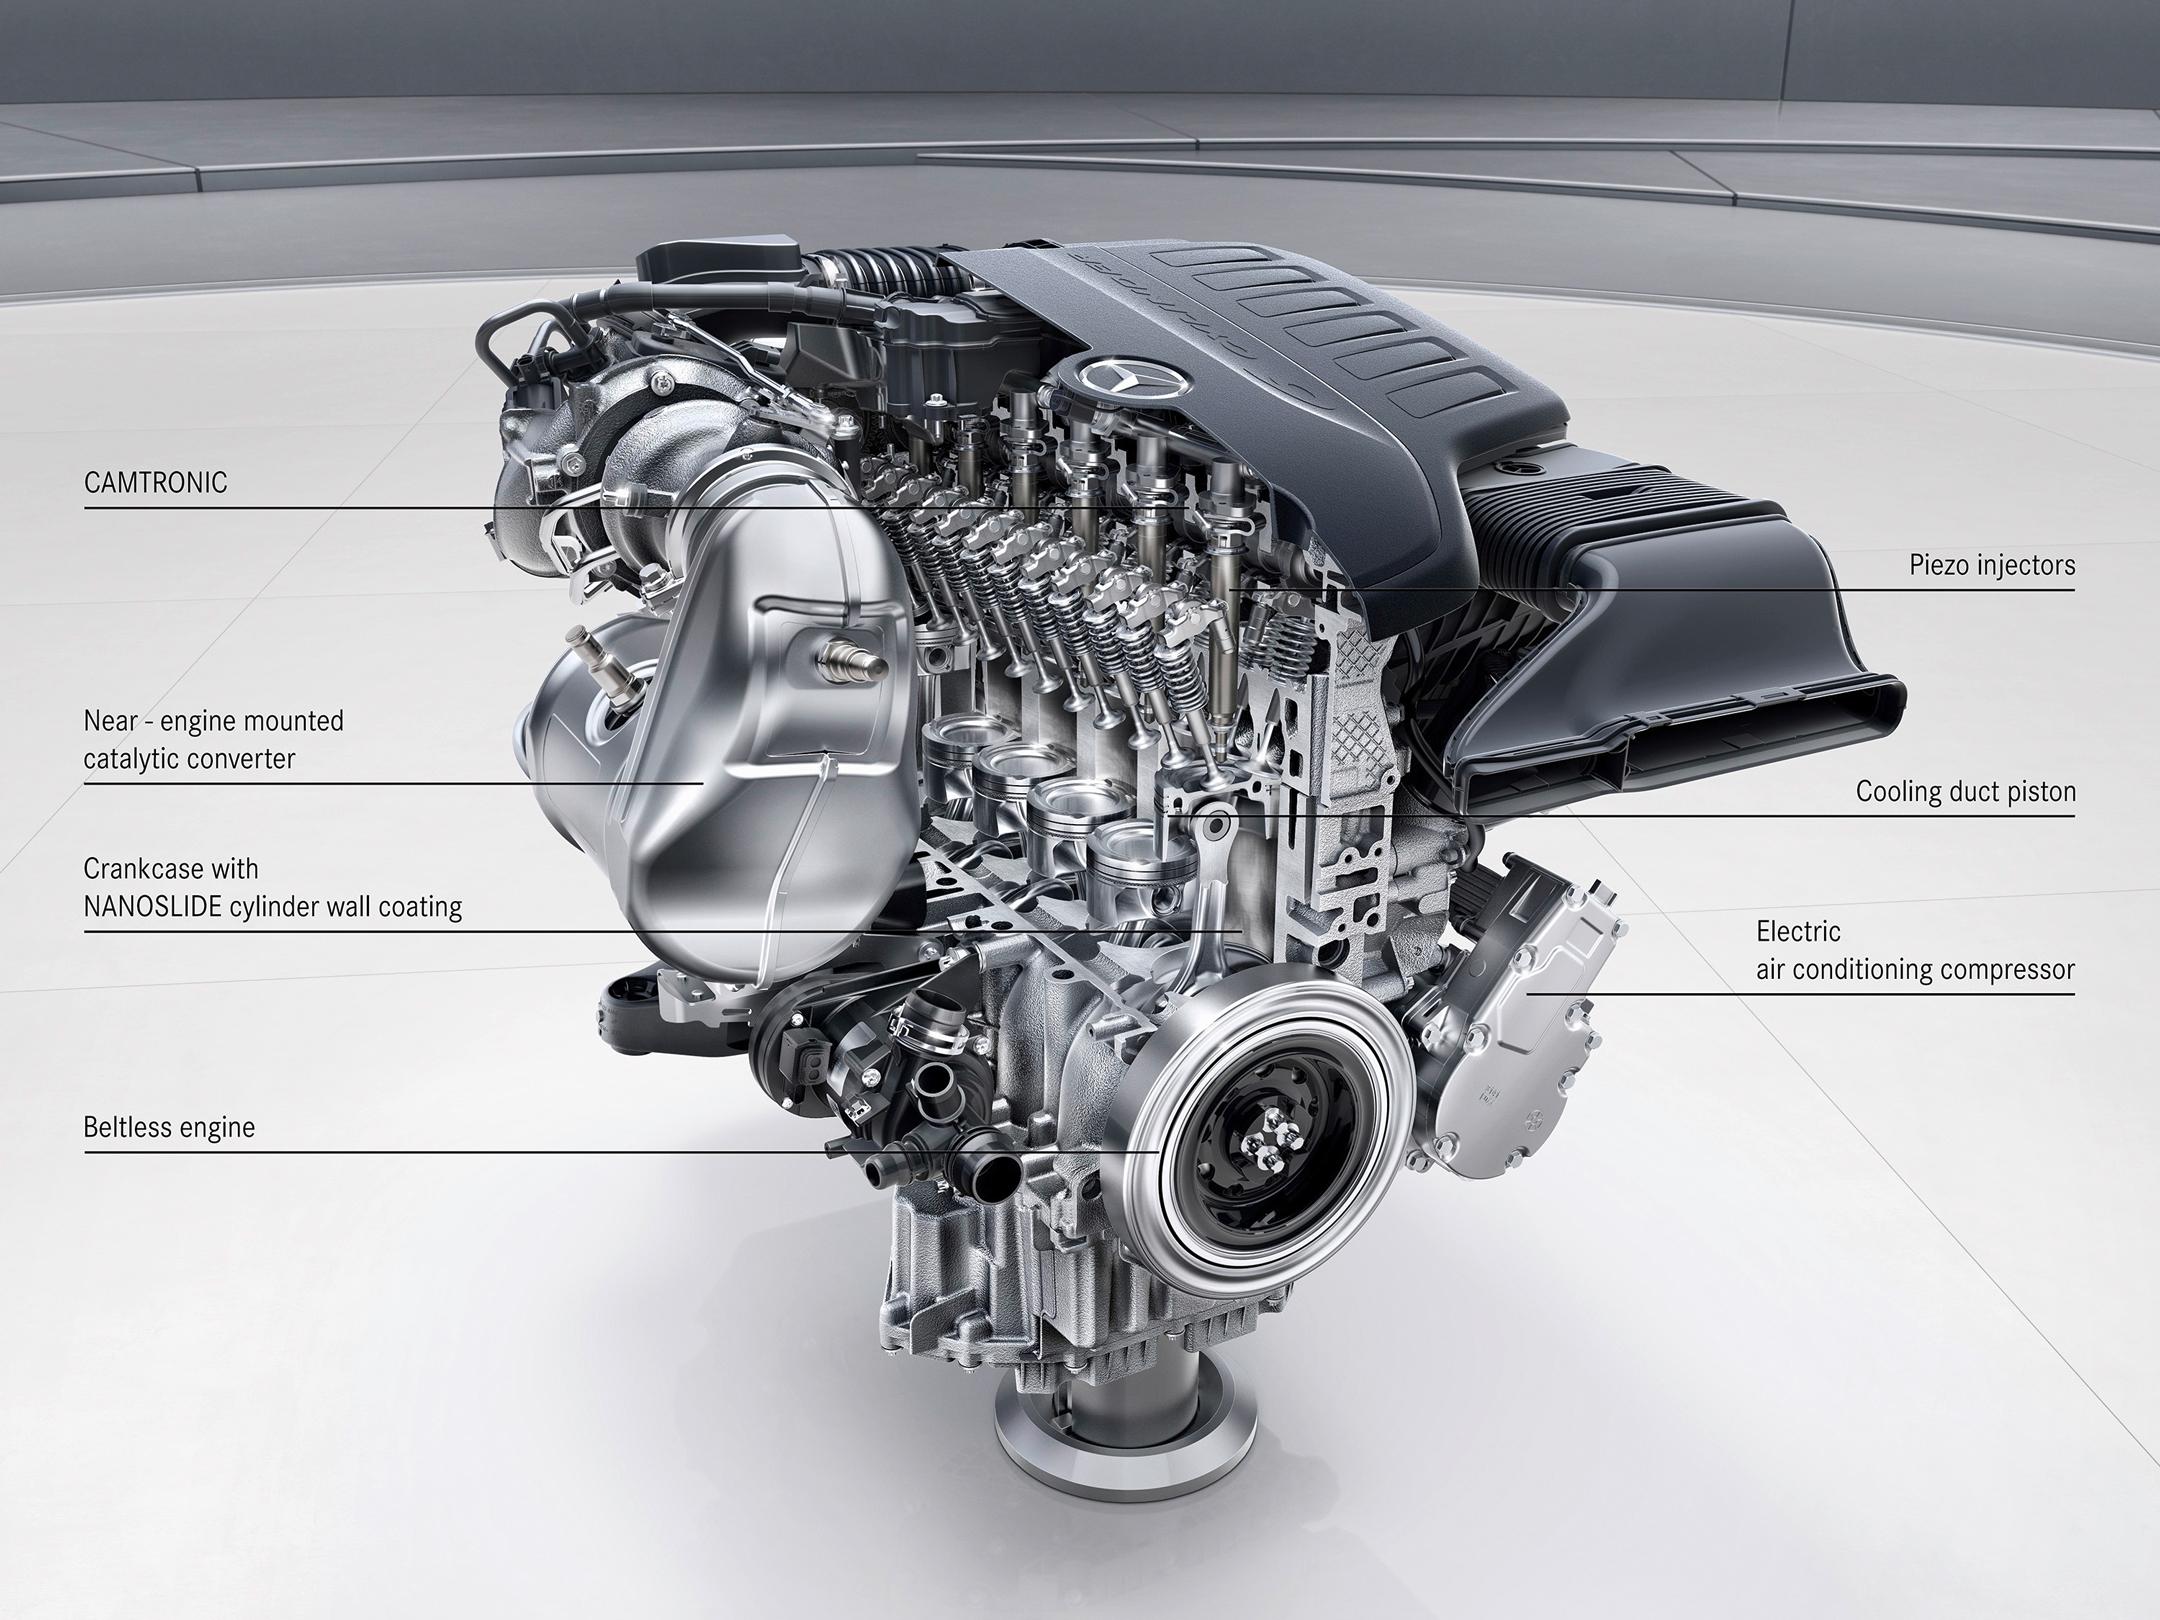 Mercedes-Benz M256 six-cylinder engine inside